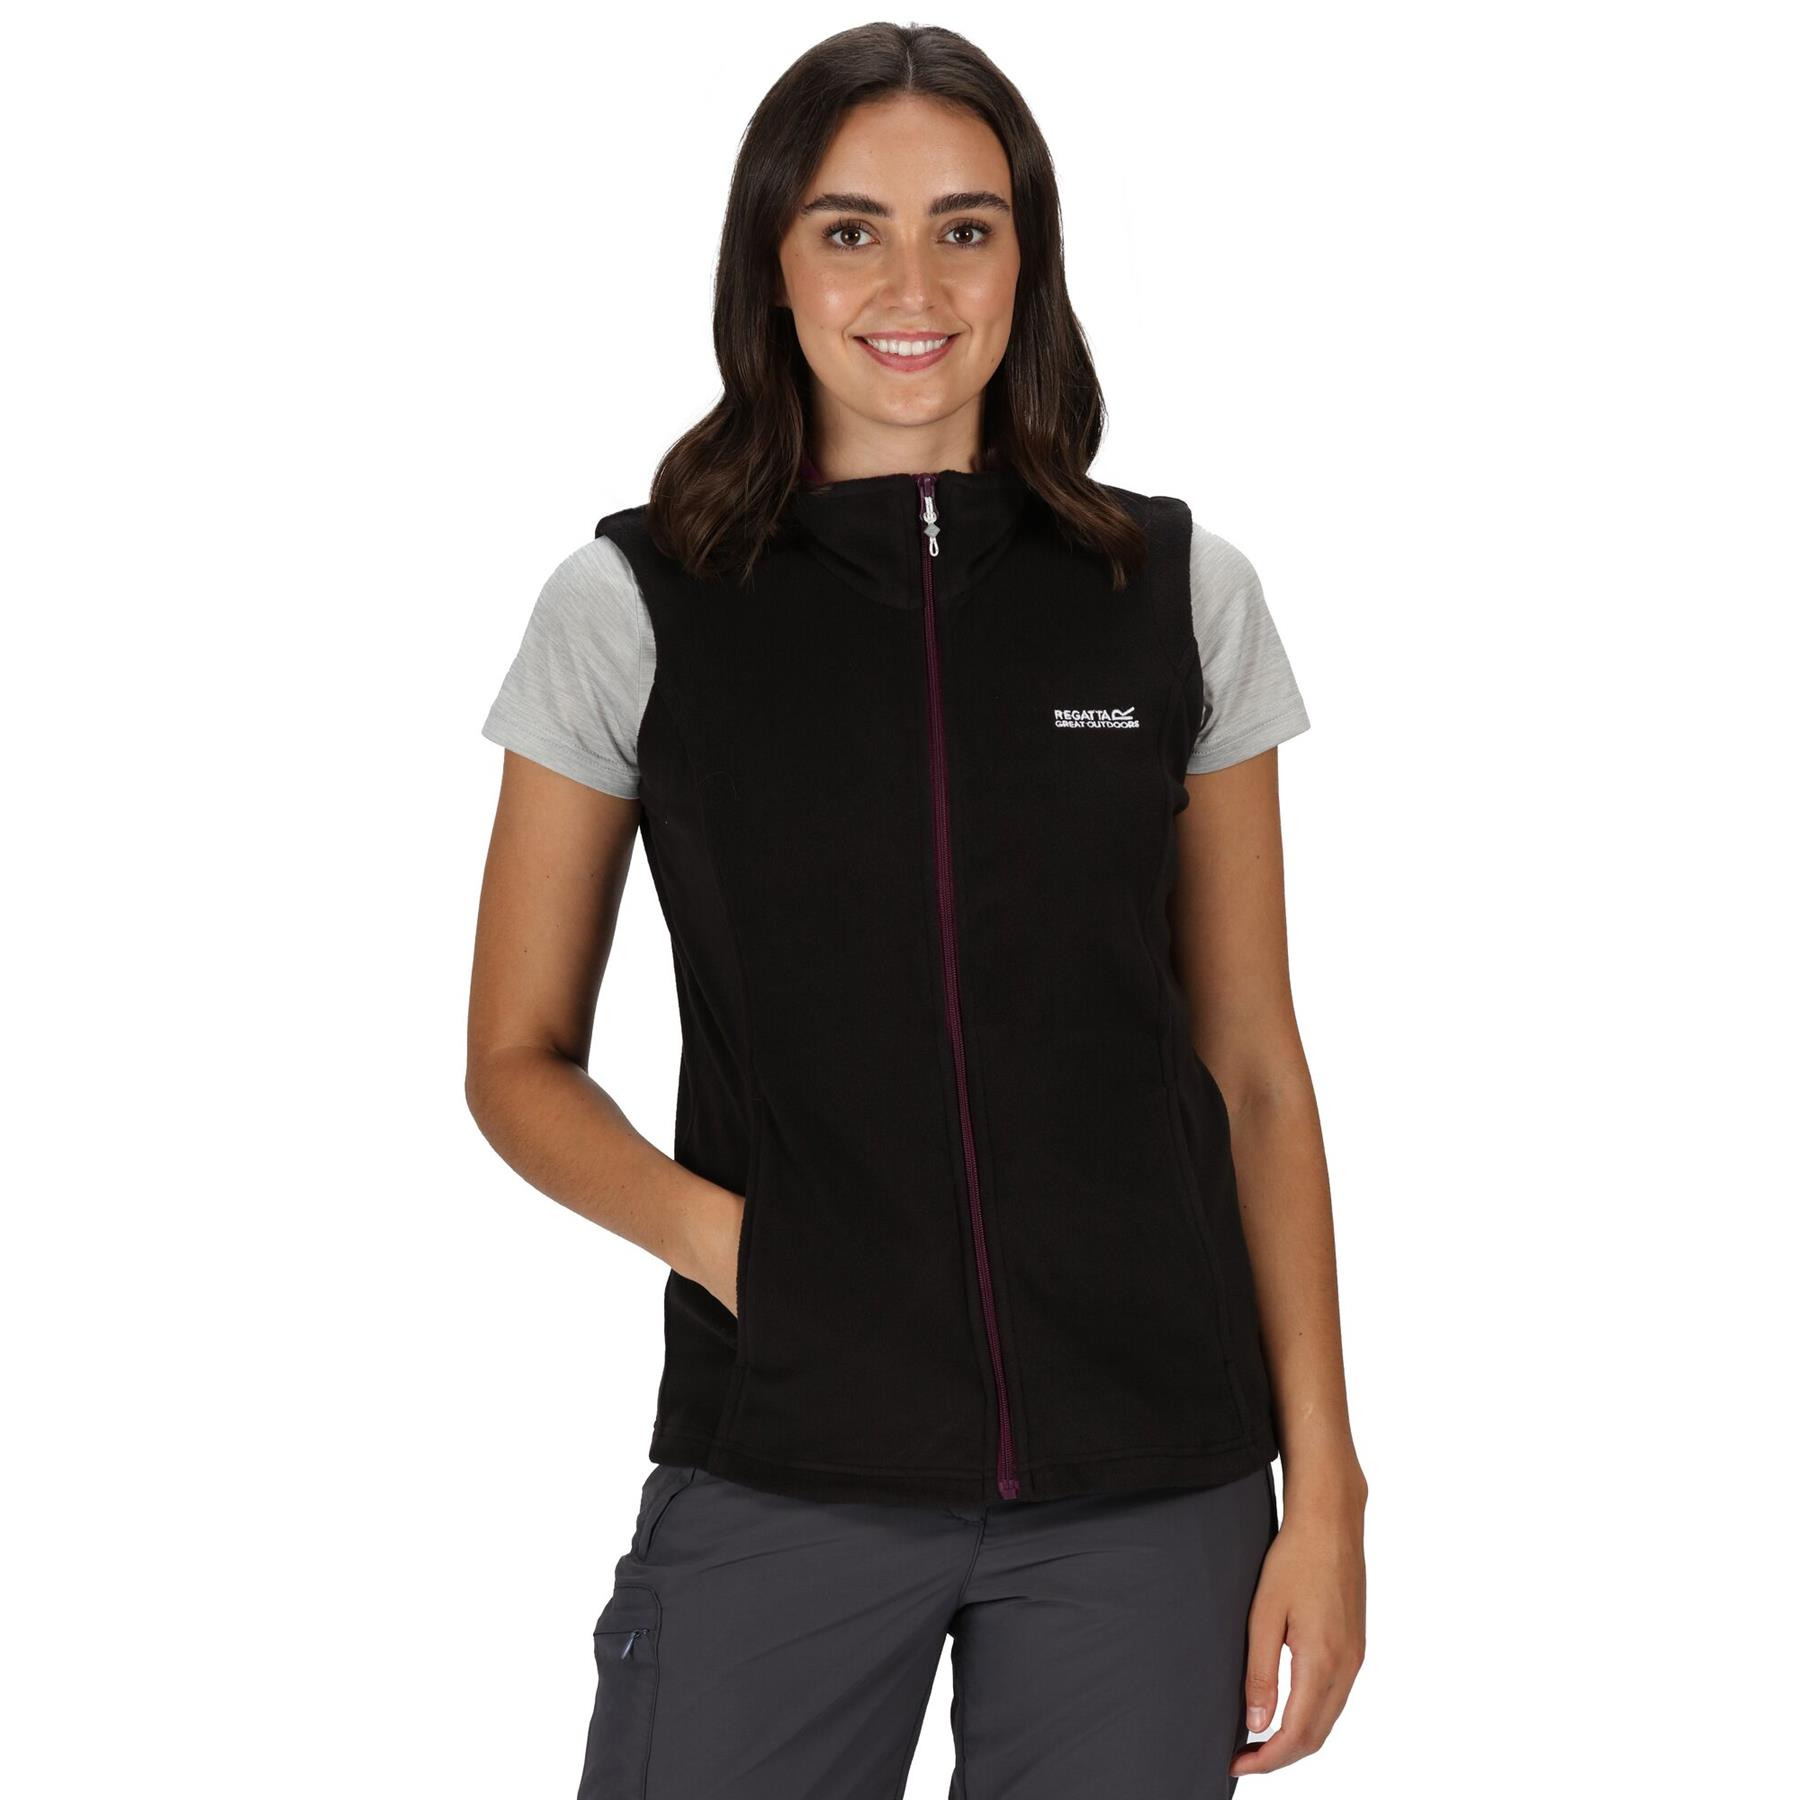 miniatuur 3 - Regatta Womens Sweetness Full Zip Micro Fleece Casual Bodywarmer Waistcoat